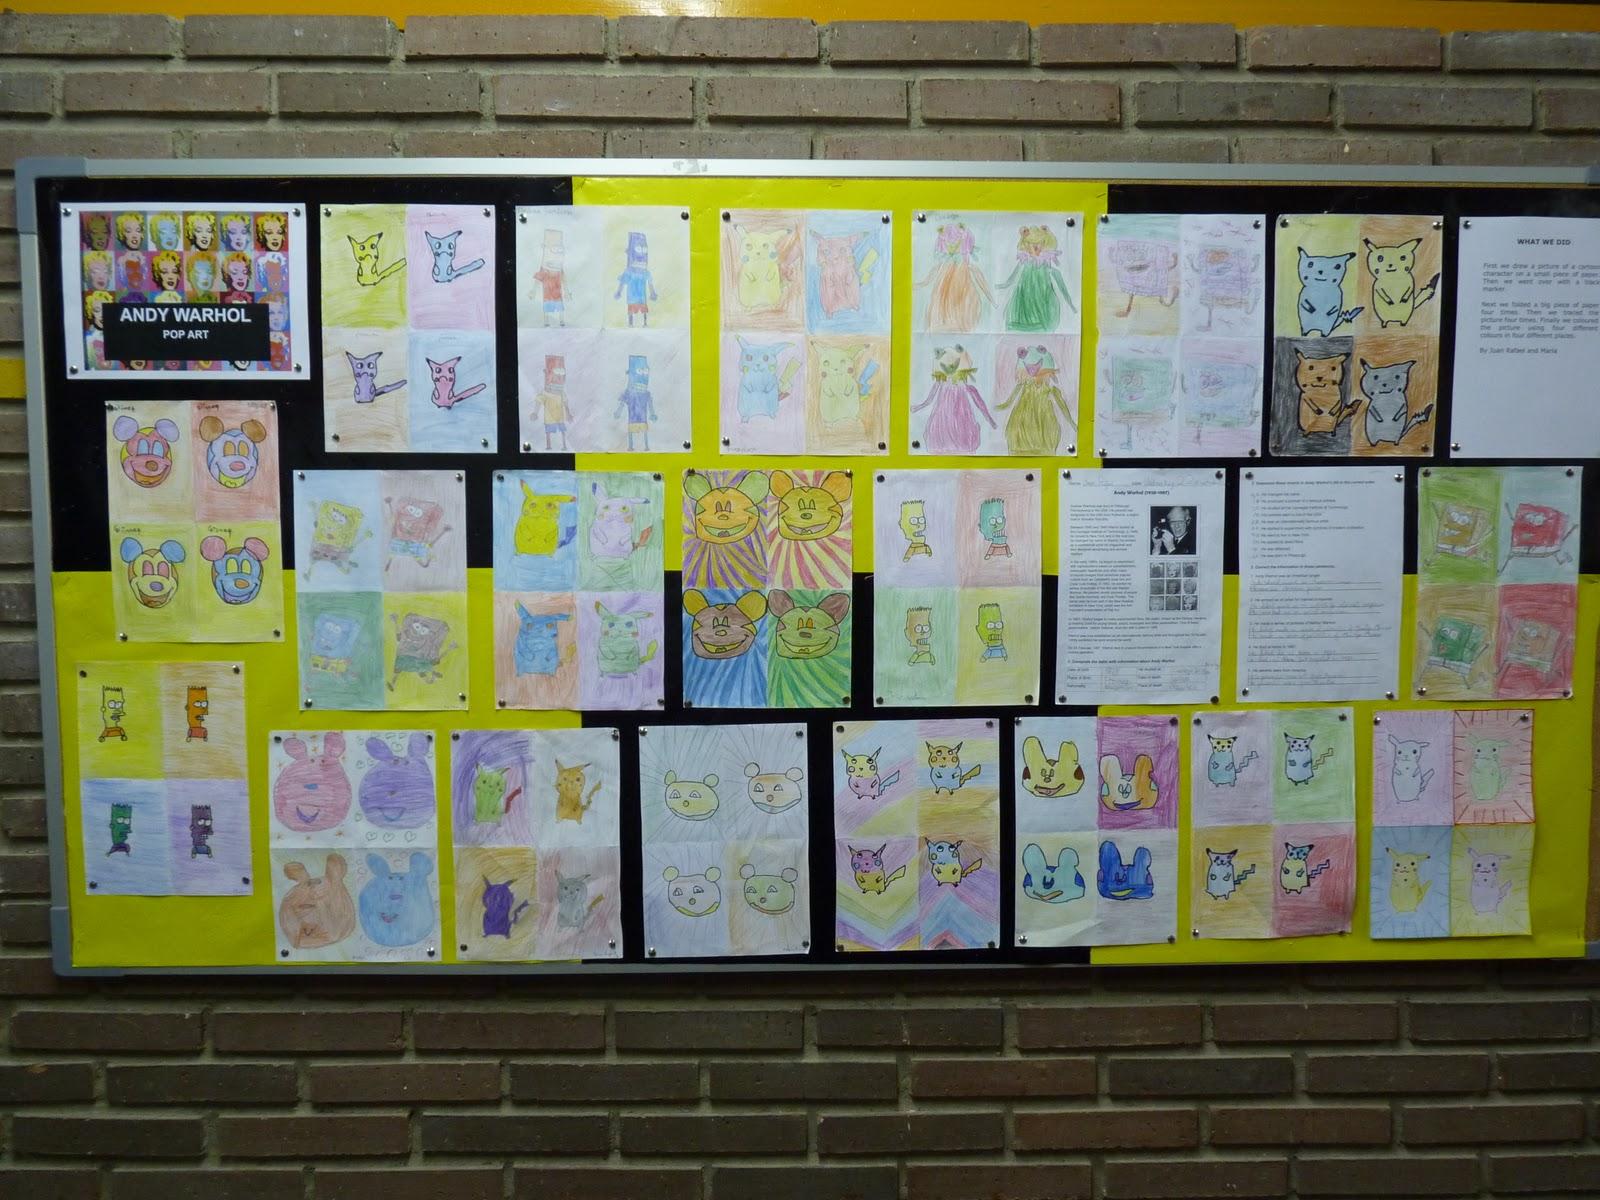 Bilingual Education Activities Andy Warhol